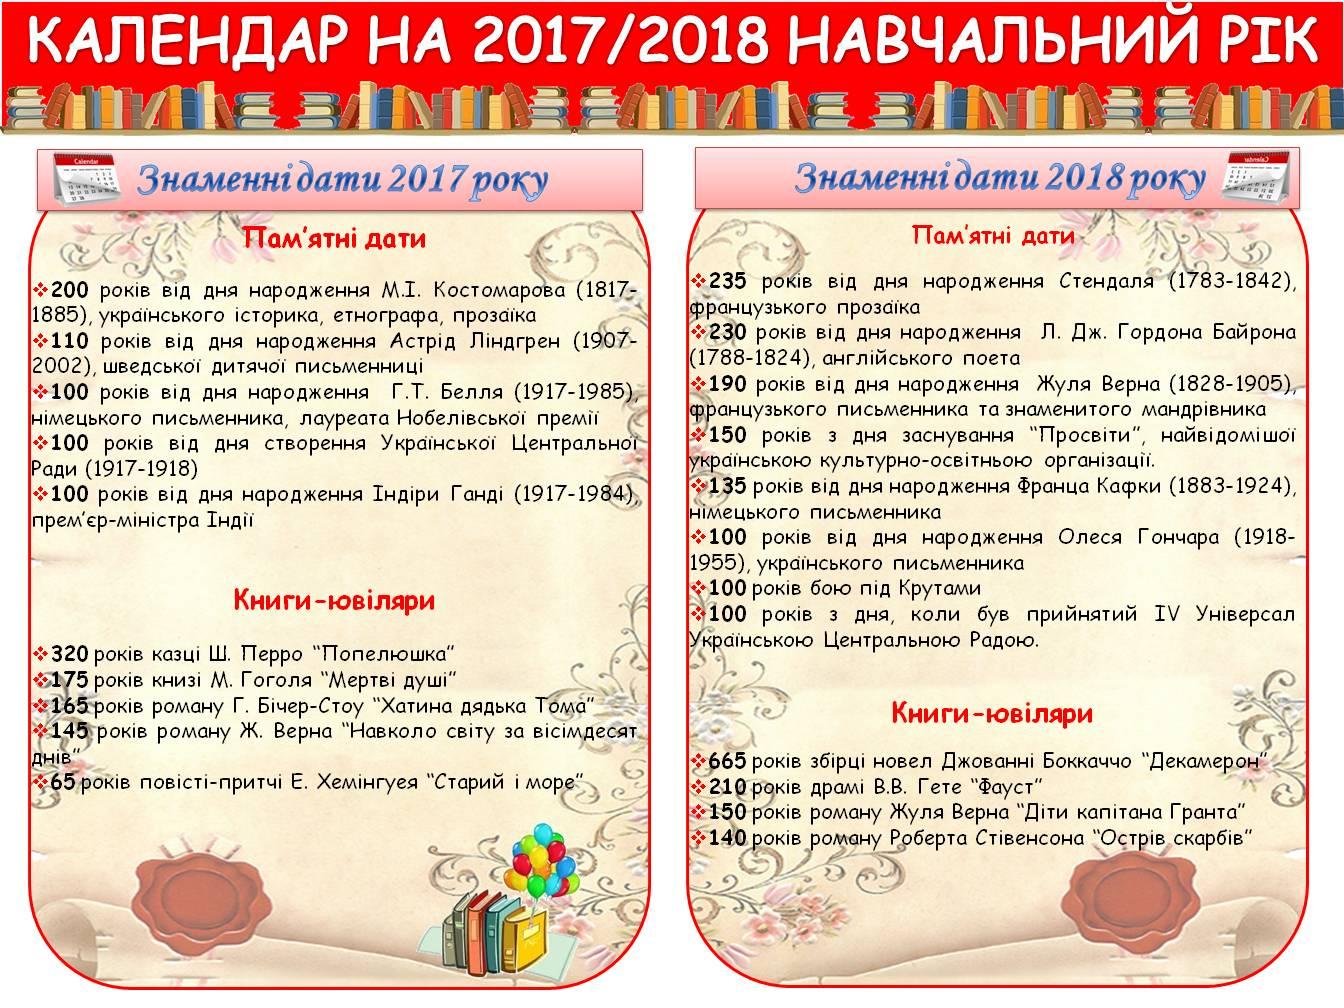 Календар знаменних та пам'ятних дат 2018